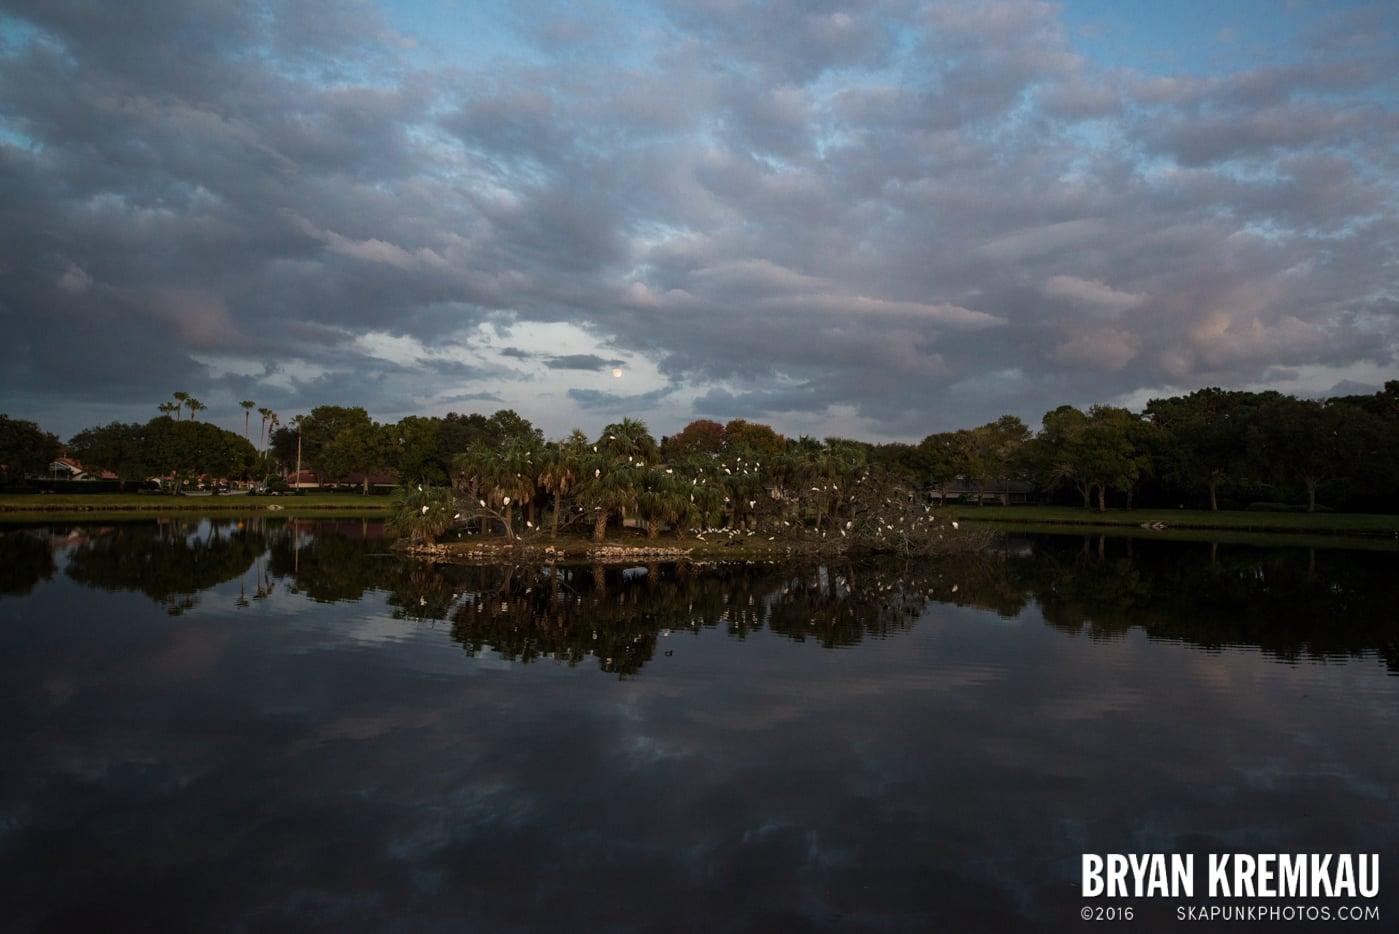 Sunsets, Astrophotography & Birds @ Venice, Florida - 10.25.14 - 11.5.14 (15)